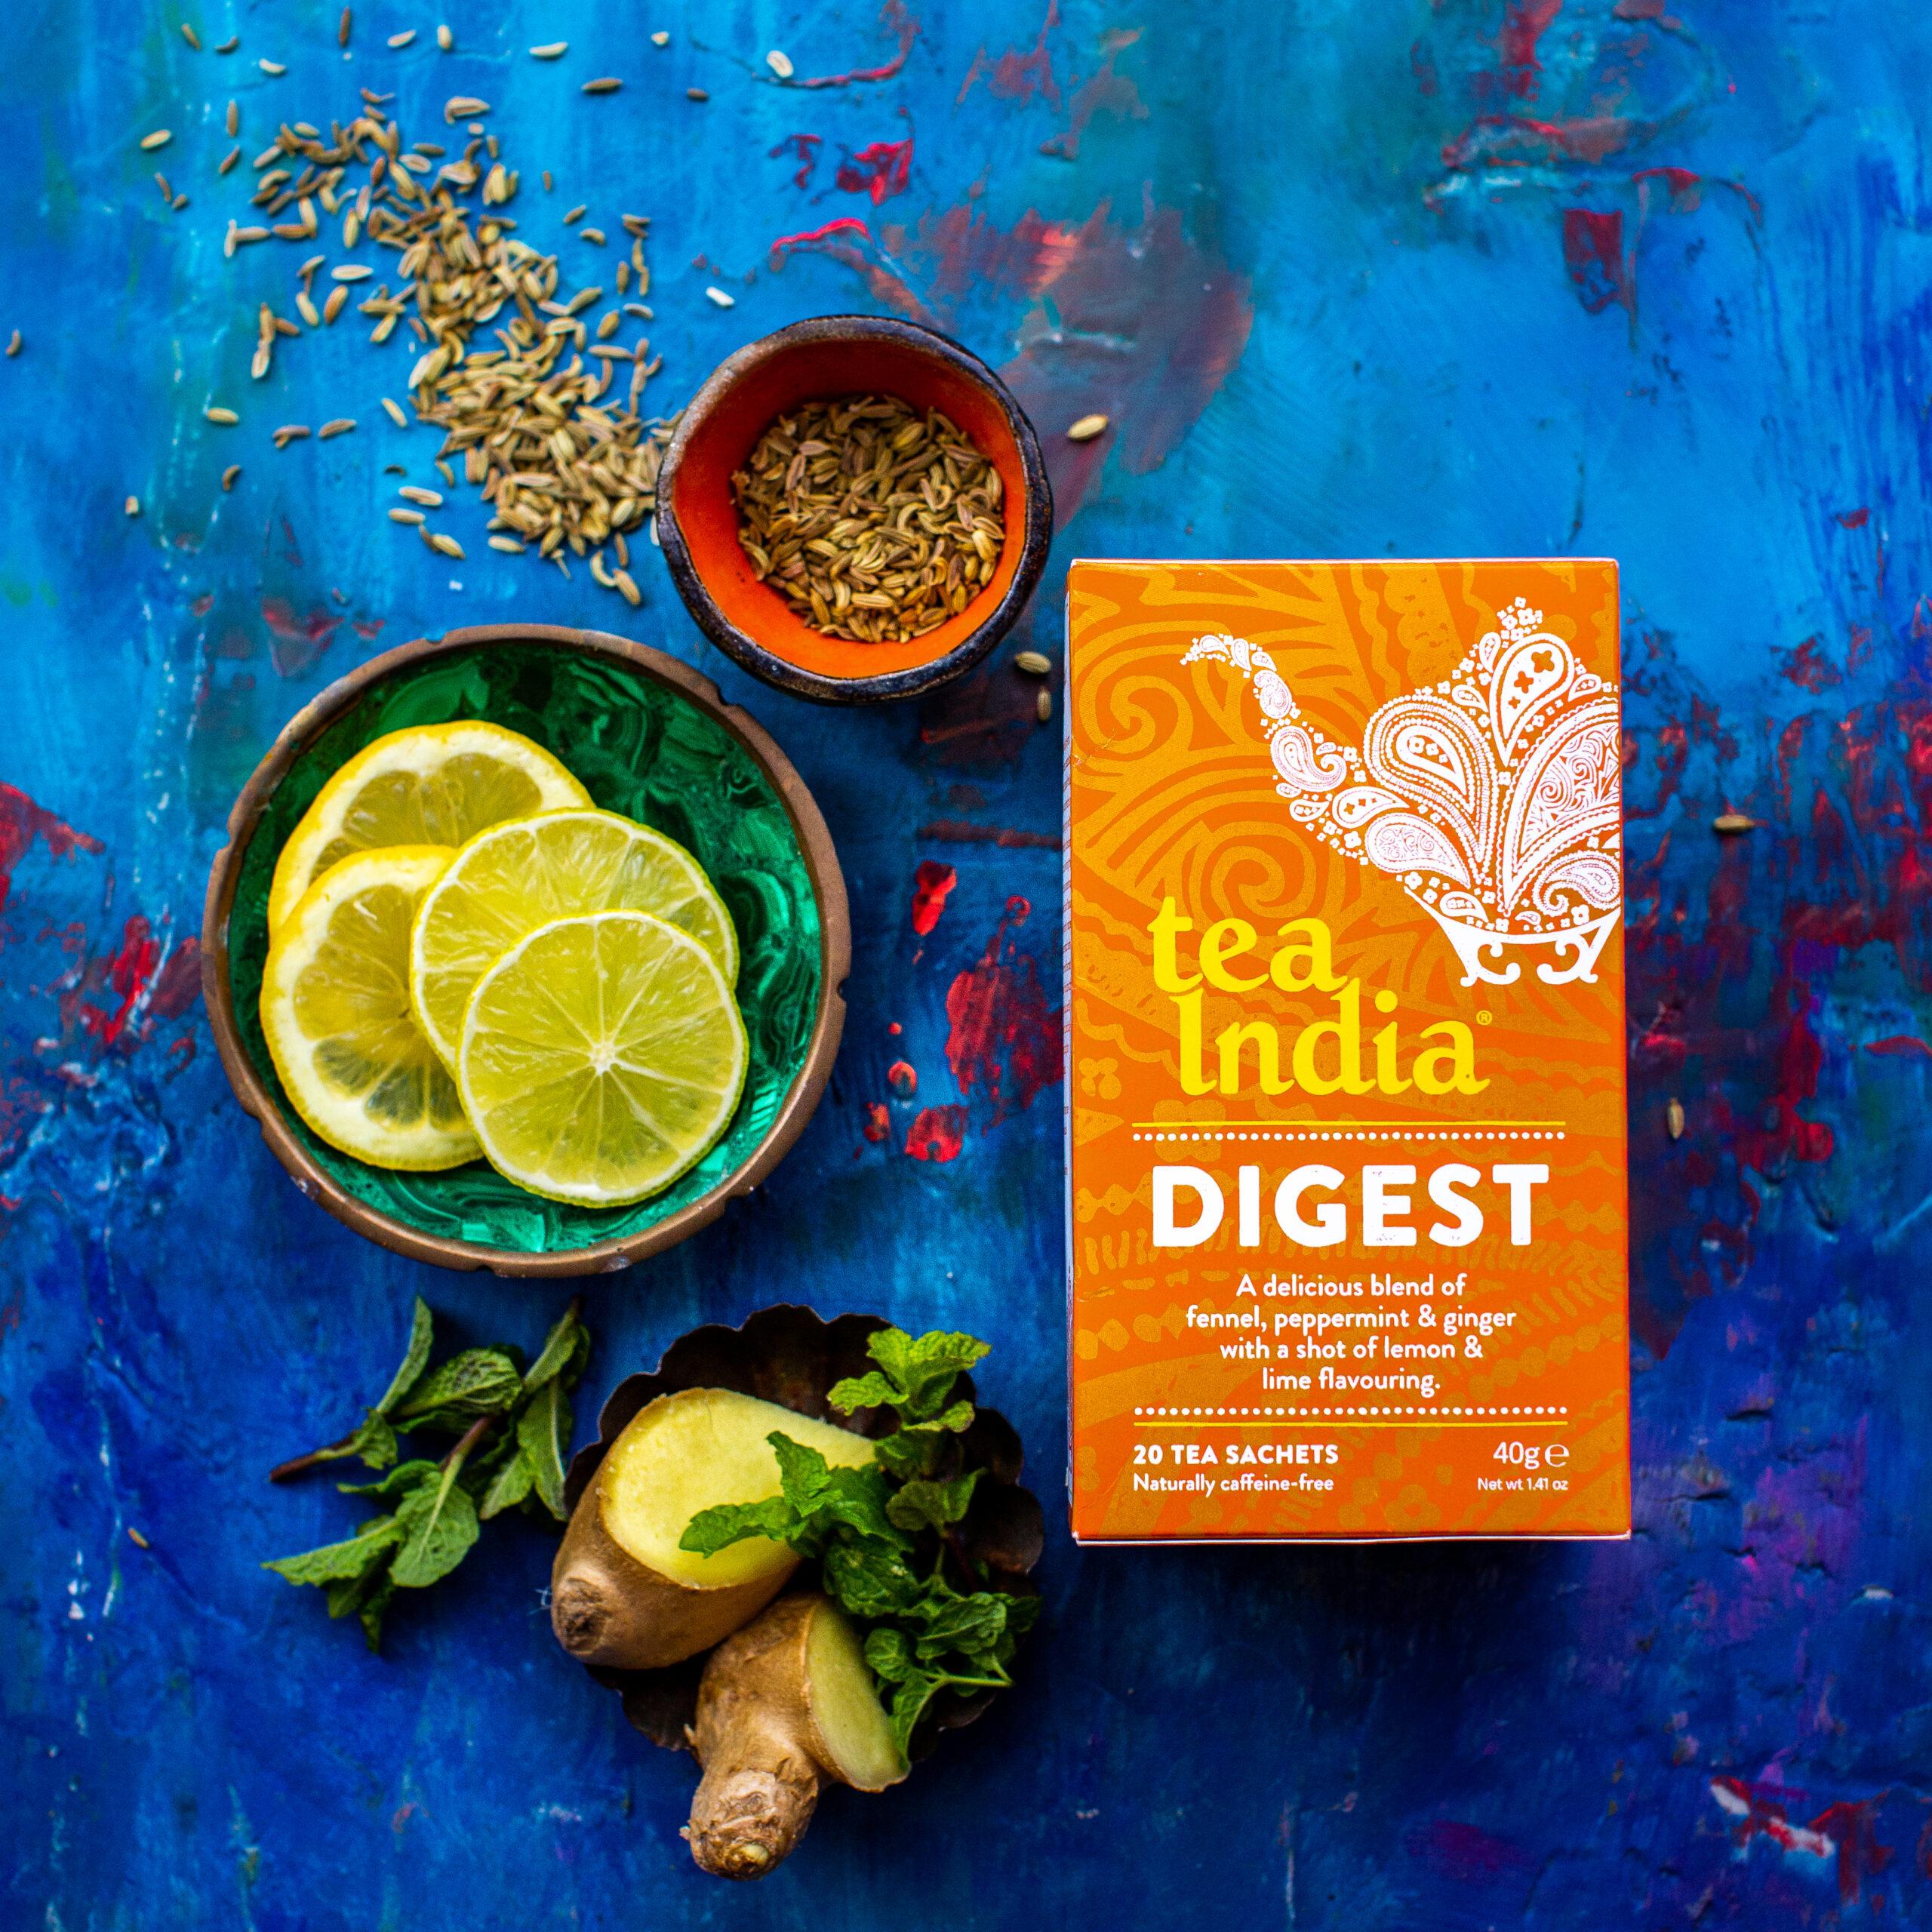 Tea India Herbal Tea for Digest